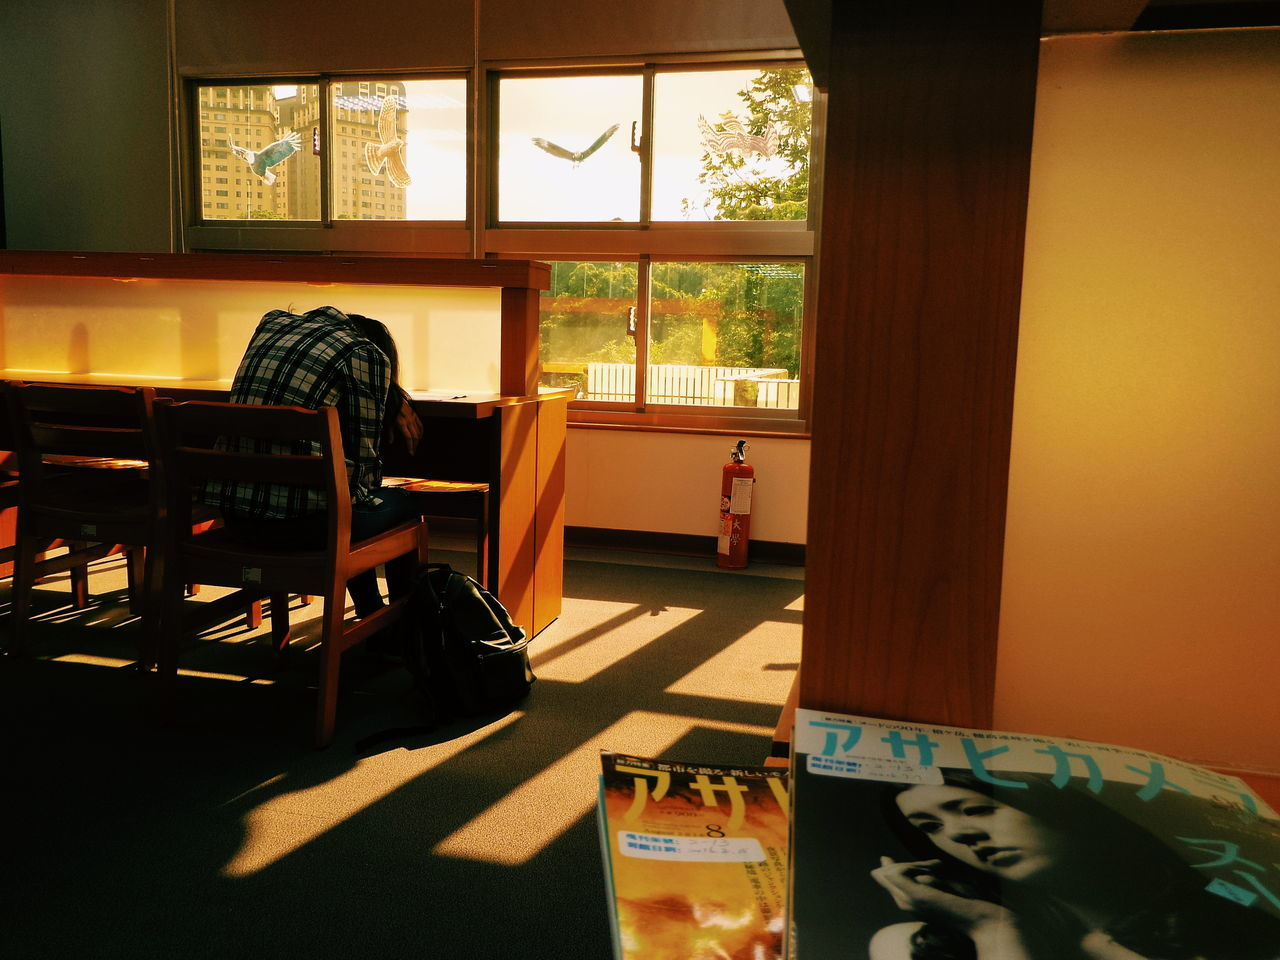 Sleepy Afternoon The Color Of School Window Indoors  Window Chair Desk Table Home Interior Flooring Room Domestic Life Hobbies Interiors Week On Eyeem Xhinmania The Week On EyeEem Vscocam Showcase August EyeEm Taiwan